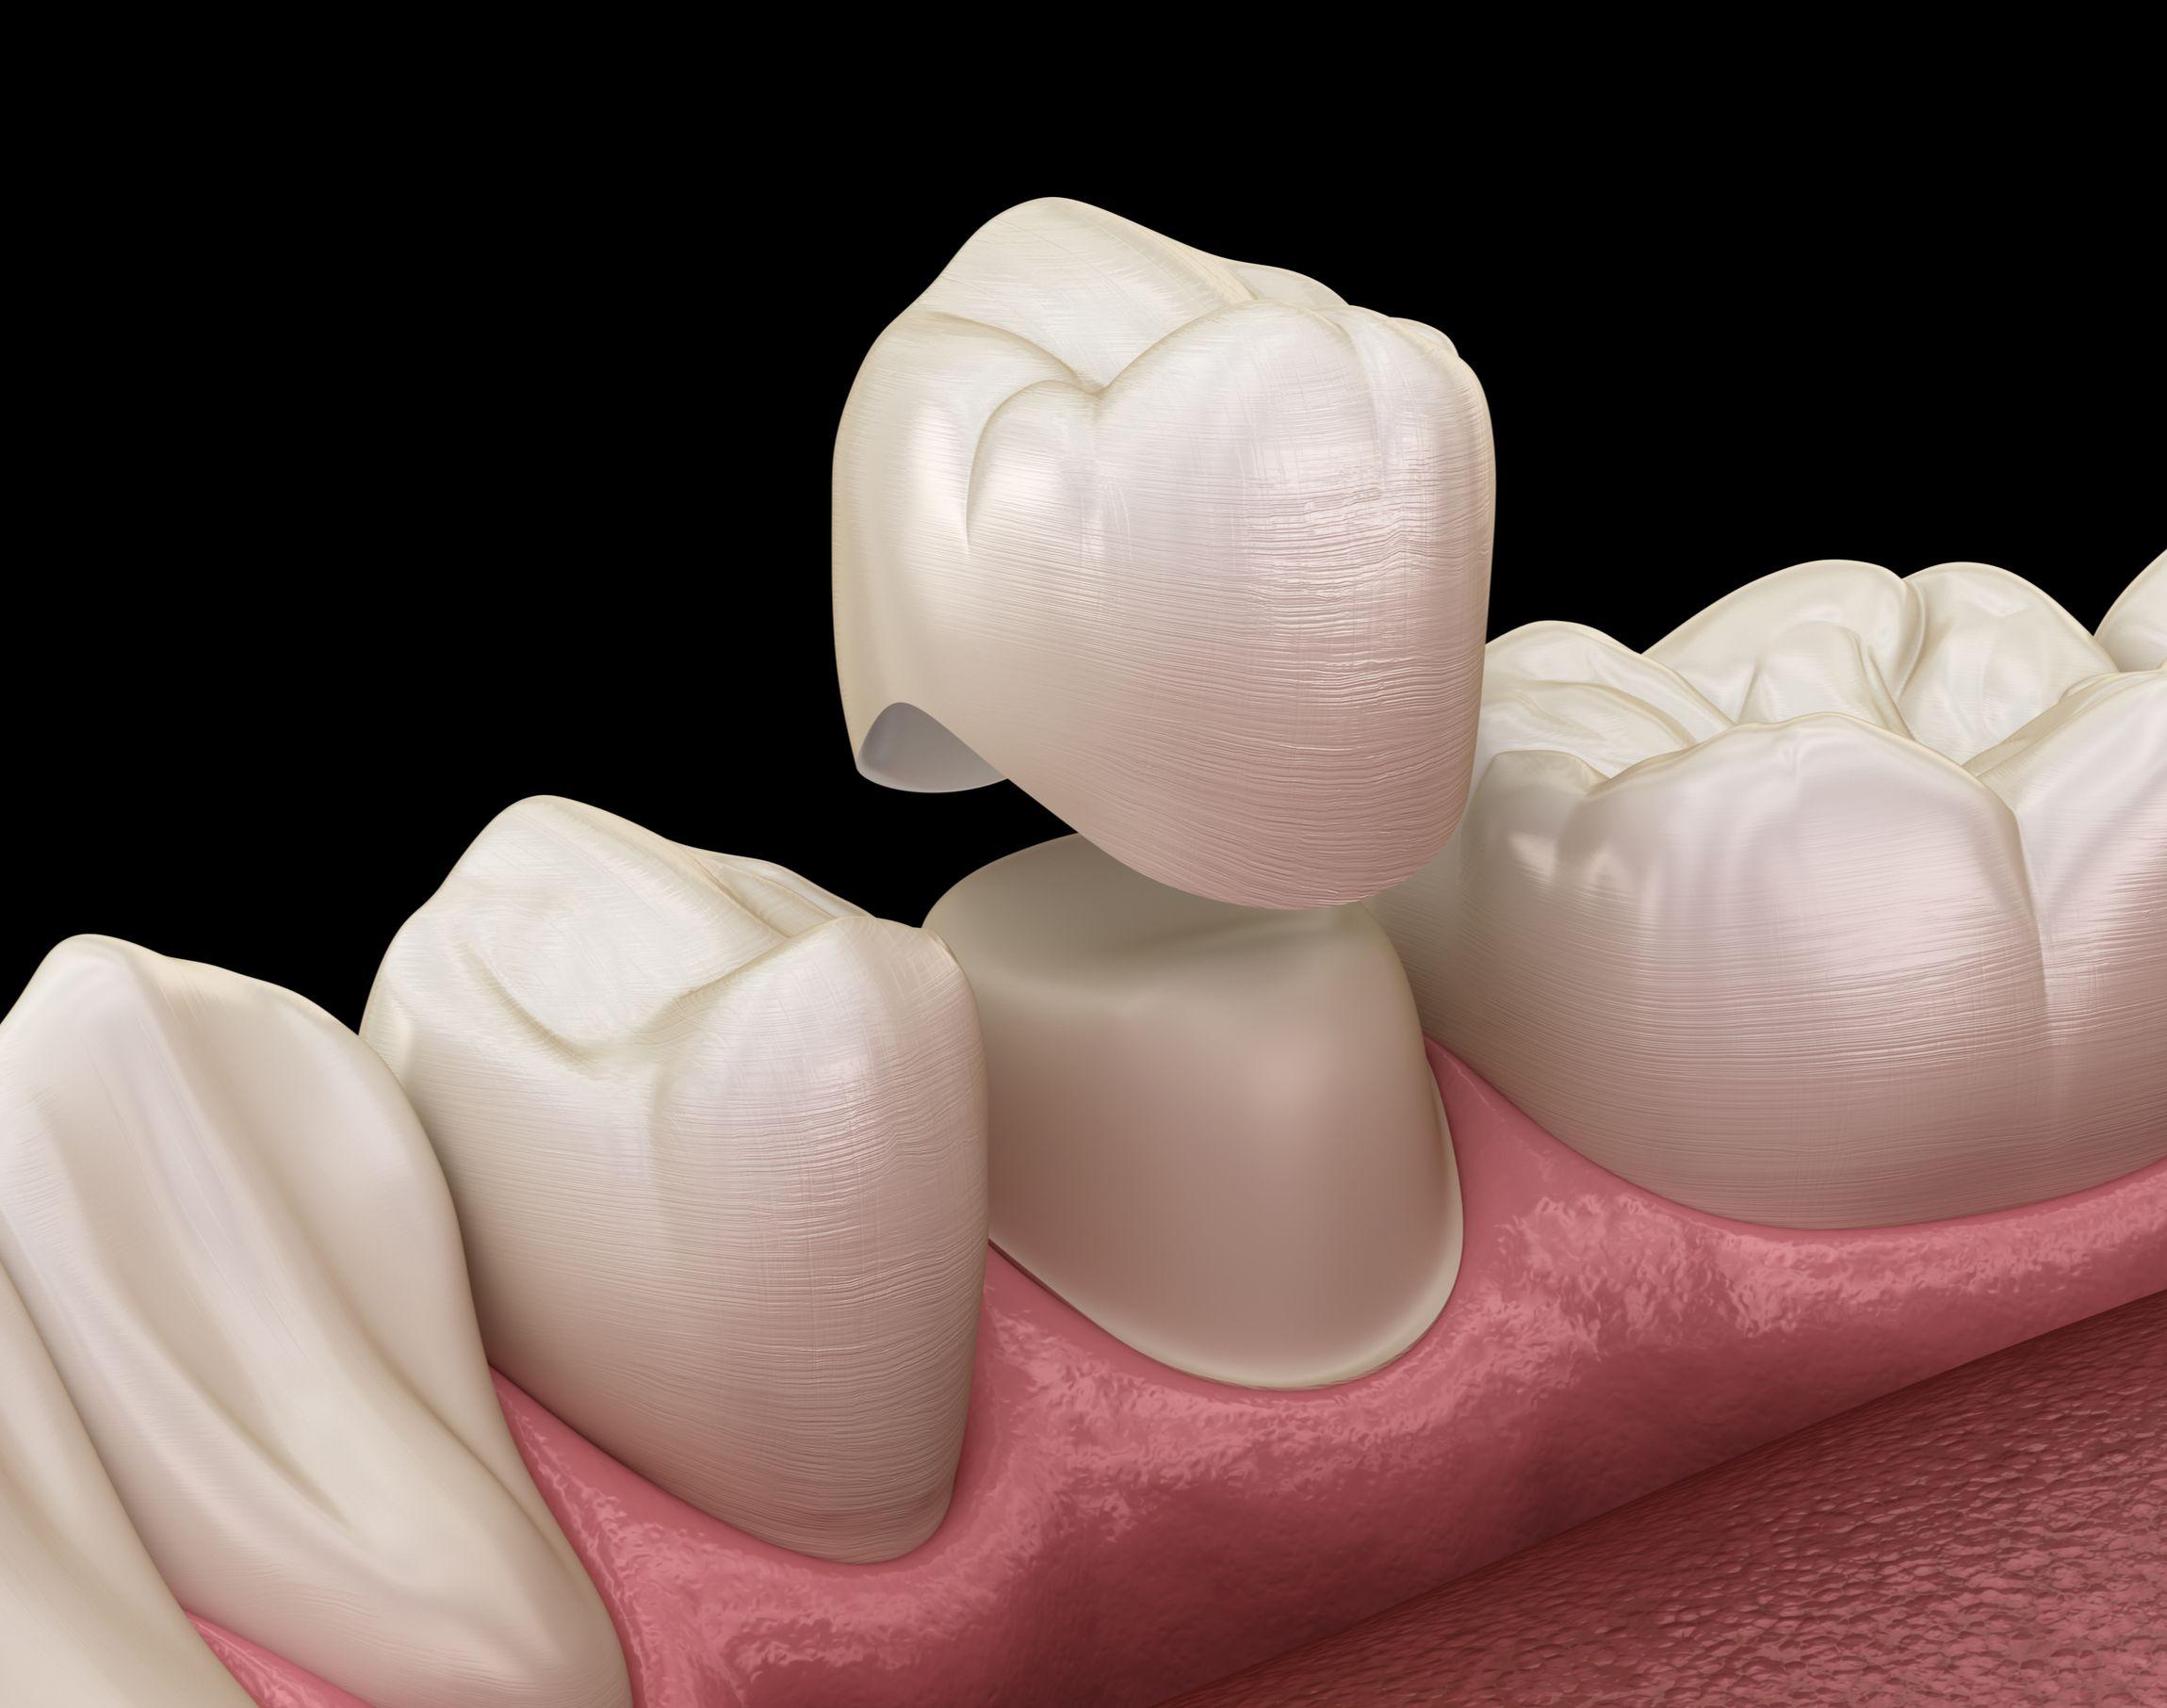 dentist celina prosper texas tx custom natural-looking dental crown all-porcelain strong